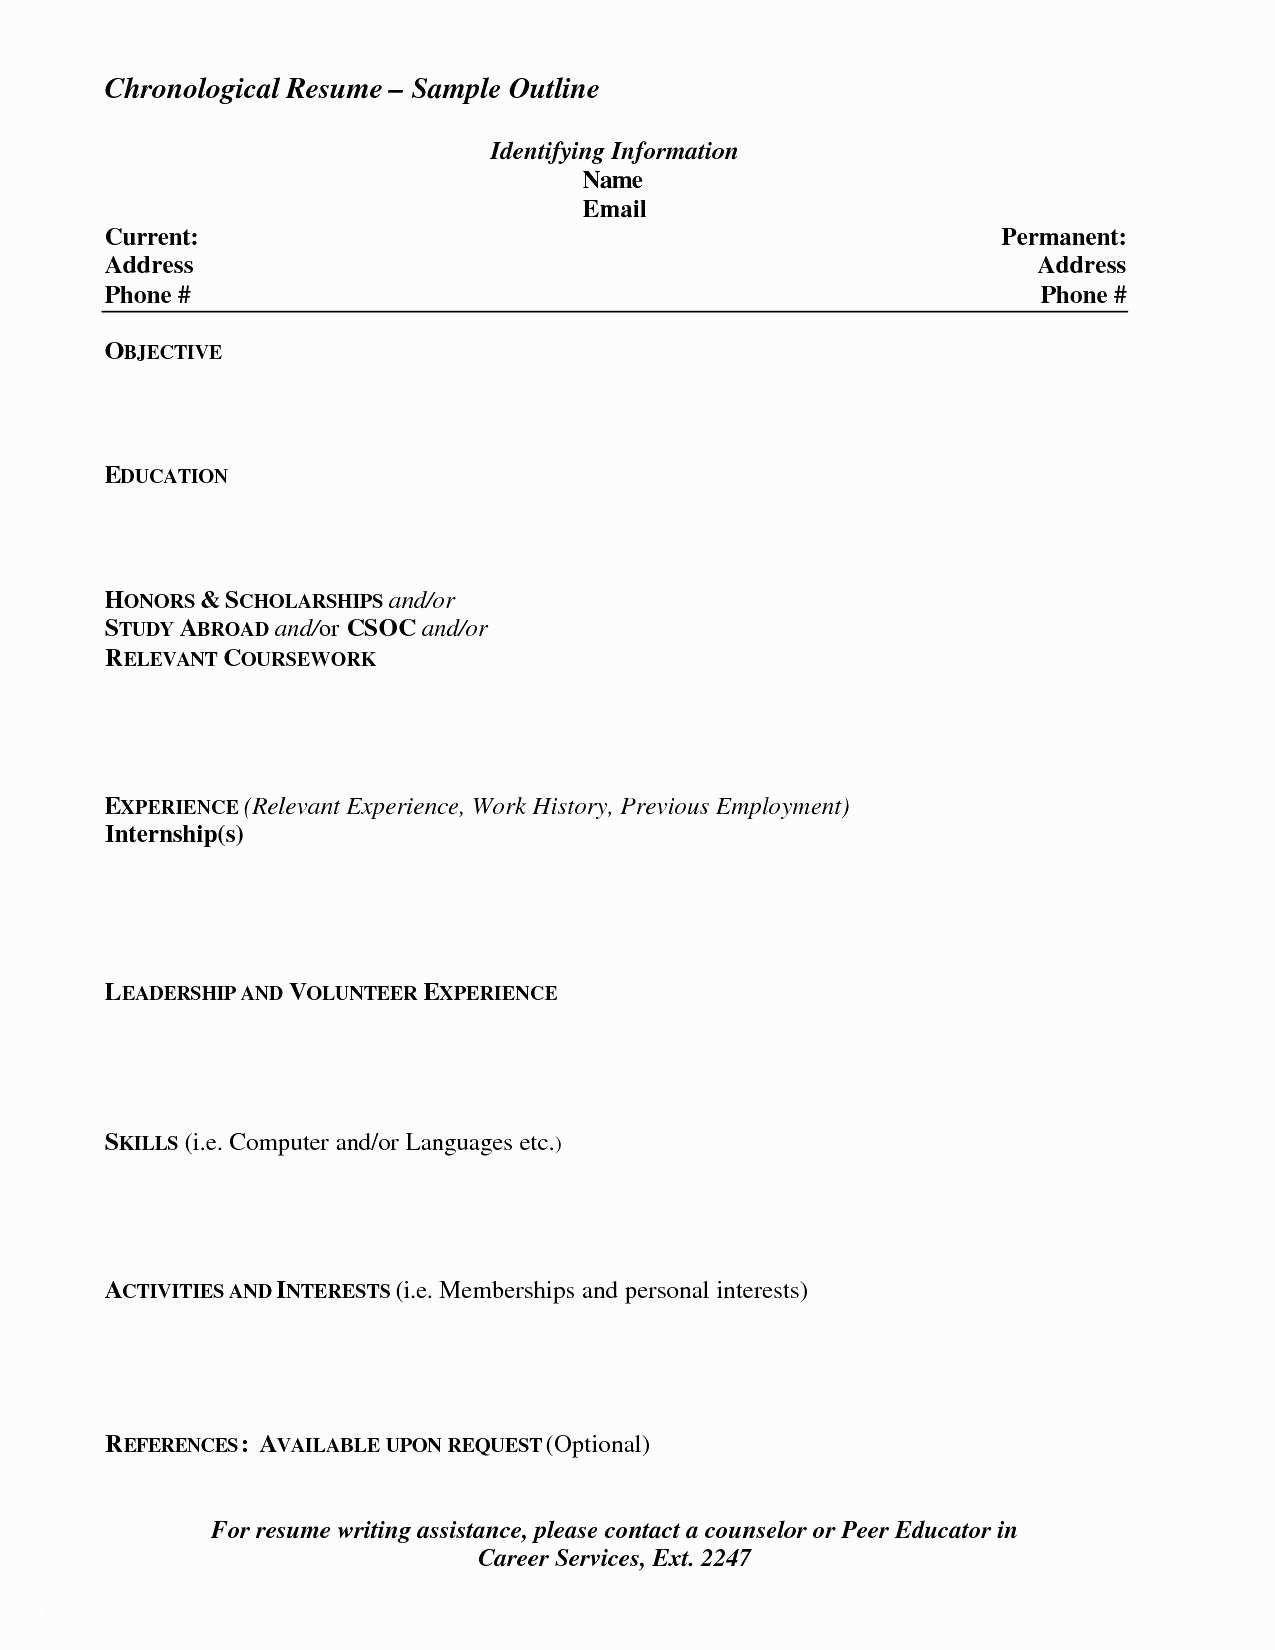 Speech Pathology Personal Statement Examples Job Resume Resume Writing Chronological Resume